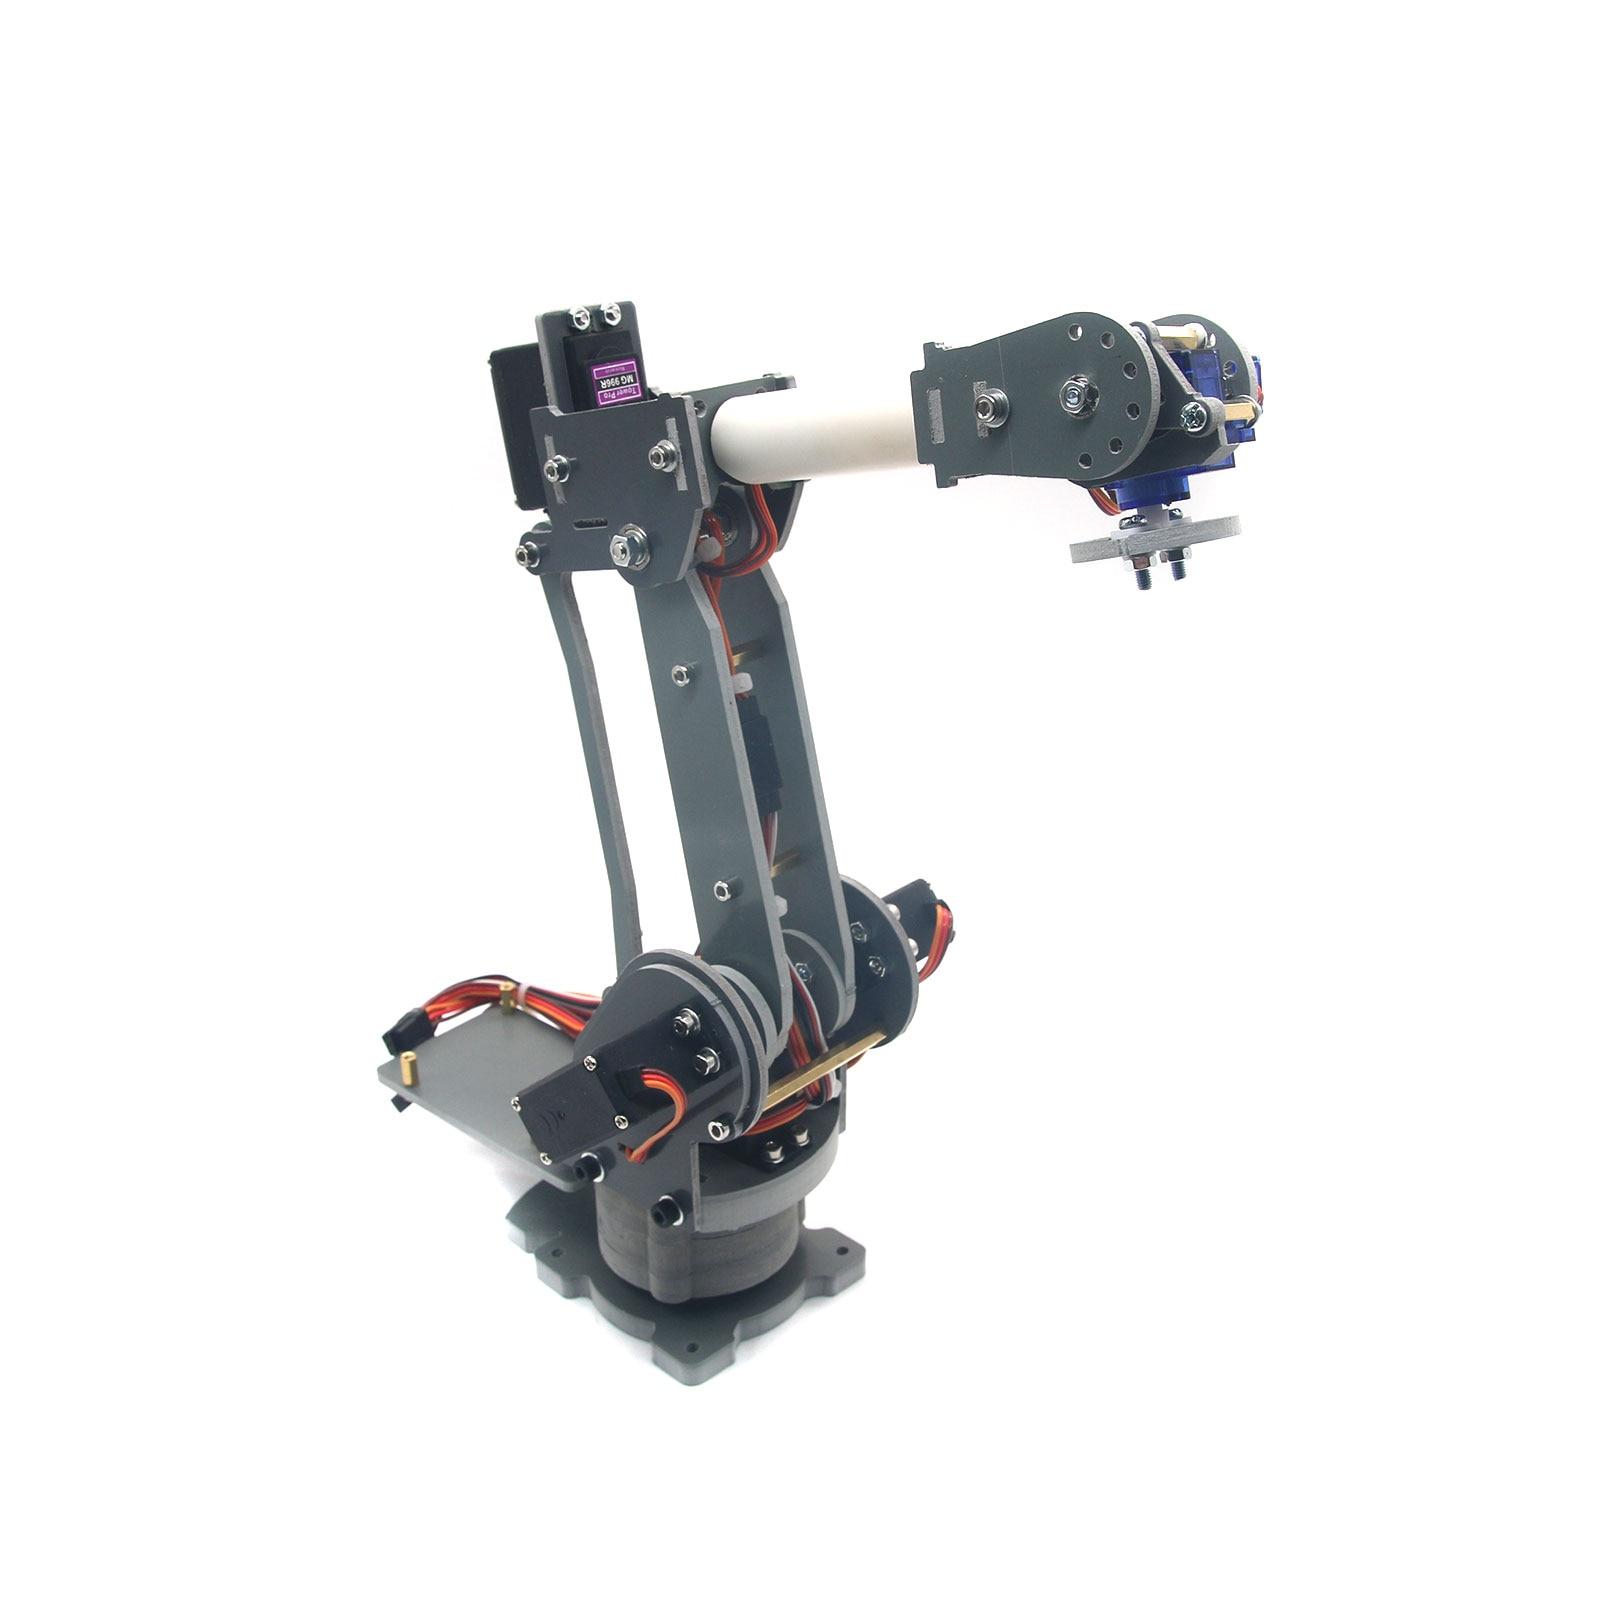 ABB 6DOF Industrial Robot Mechanical Arm Alloy Robotics Arm Rack with Servos for Arduino Assembled полюс abb 1sca105461r1001